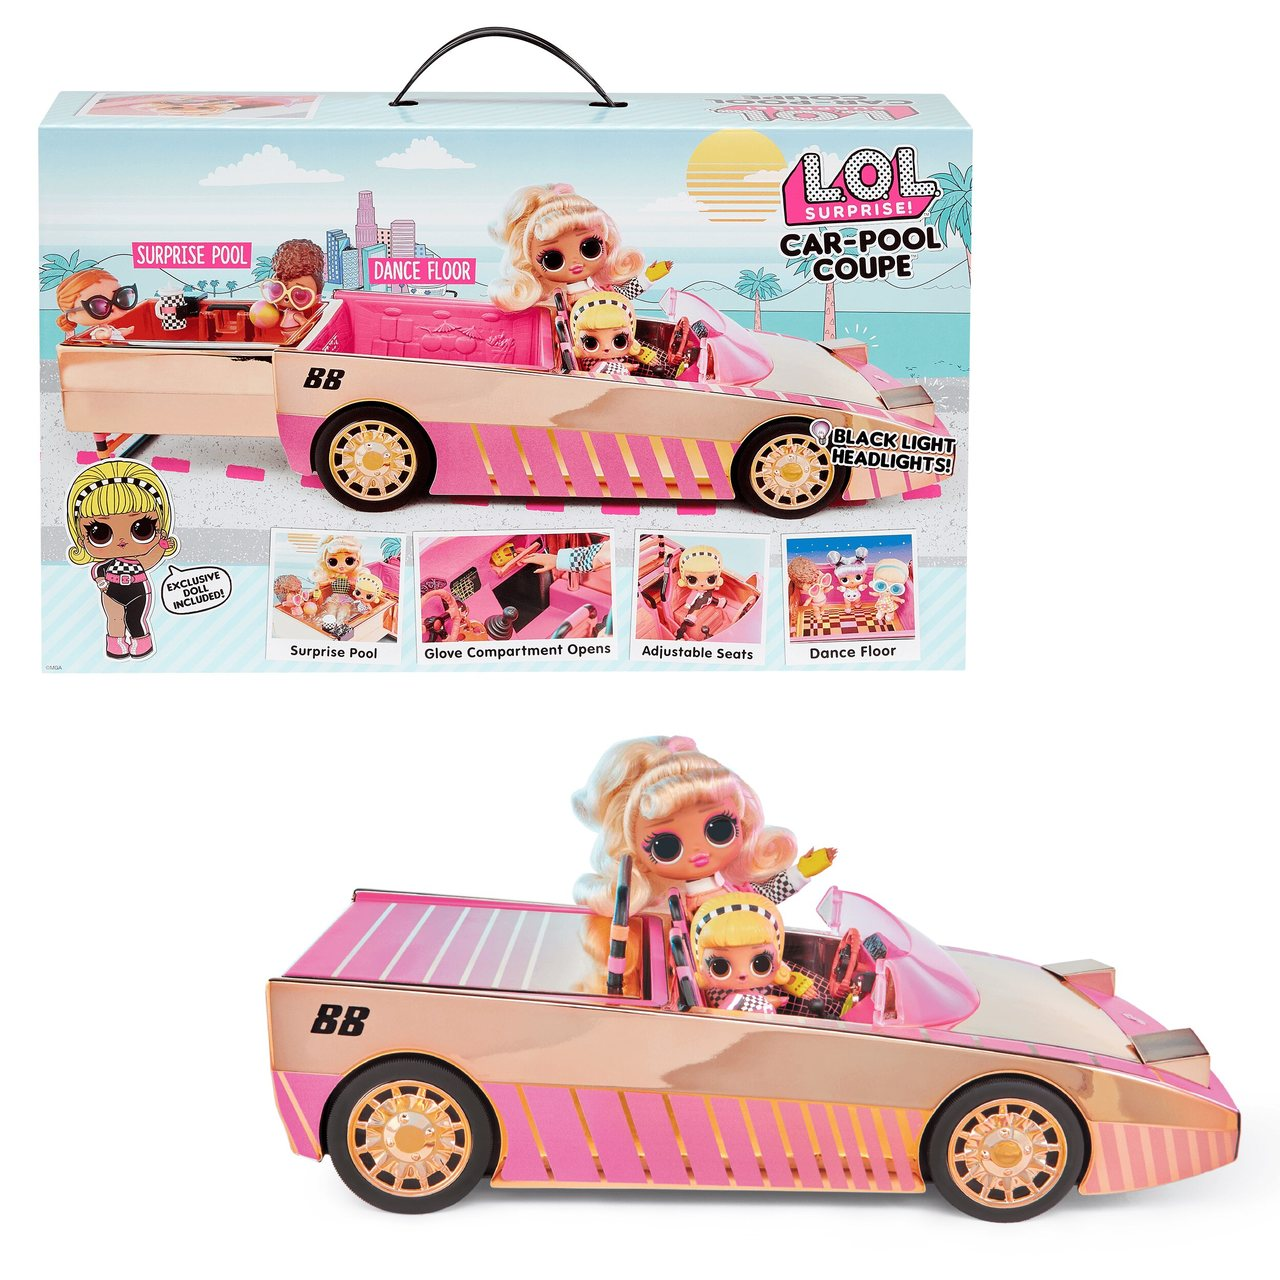 Veículo LOL Surprise: Car Pool Coupe  - Candide